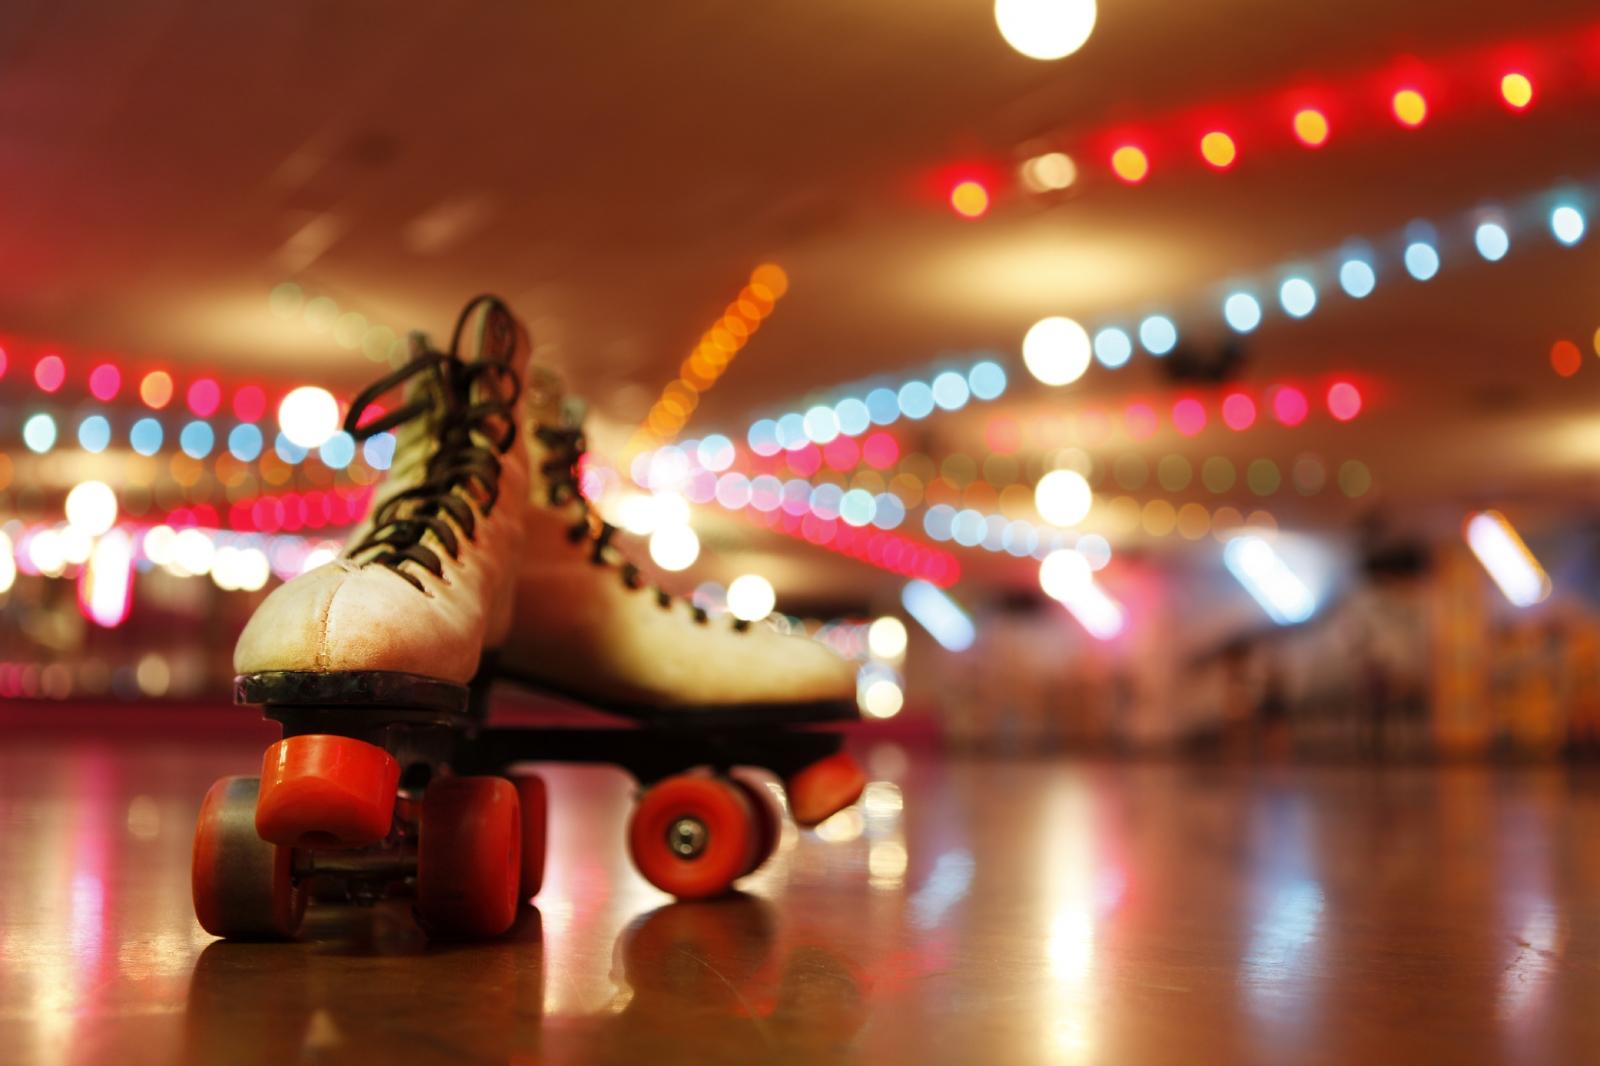 Roller skating rink ontario - Roller Skating Rink Ontario 20